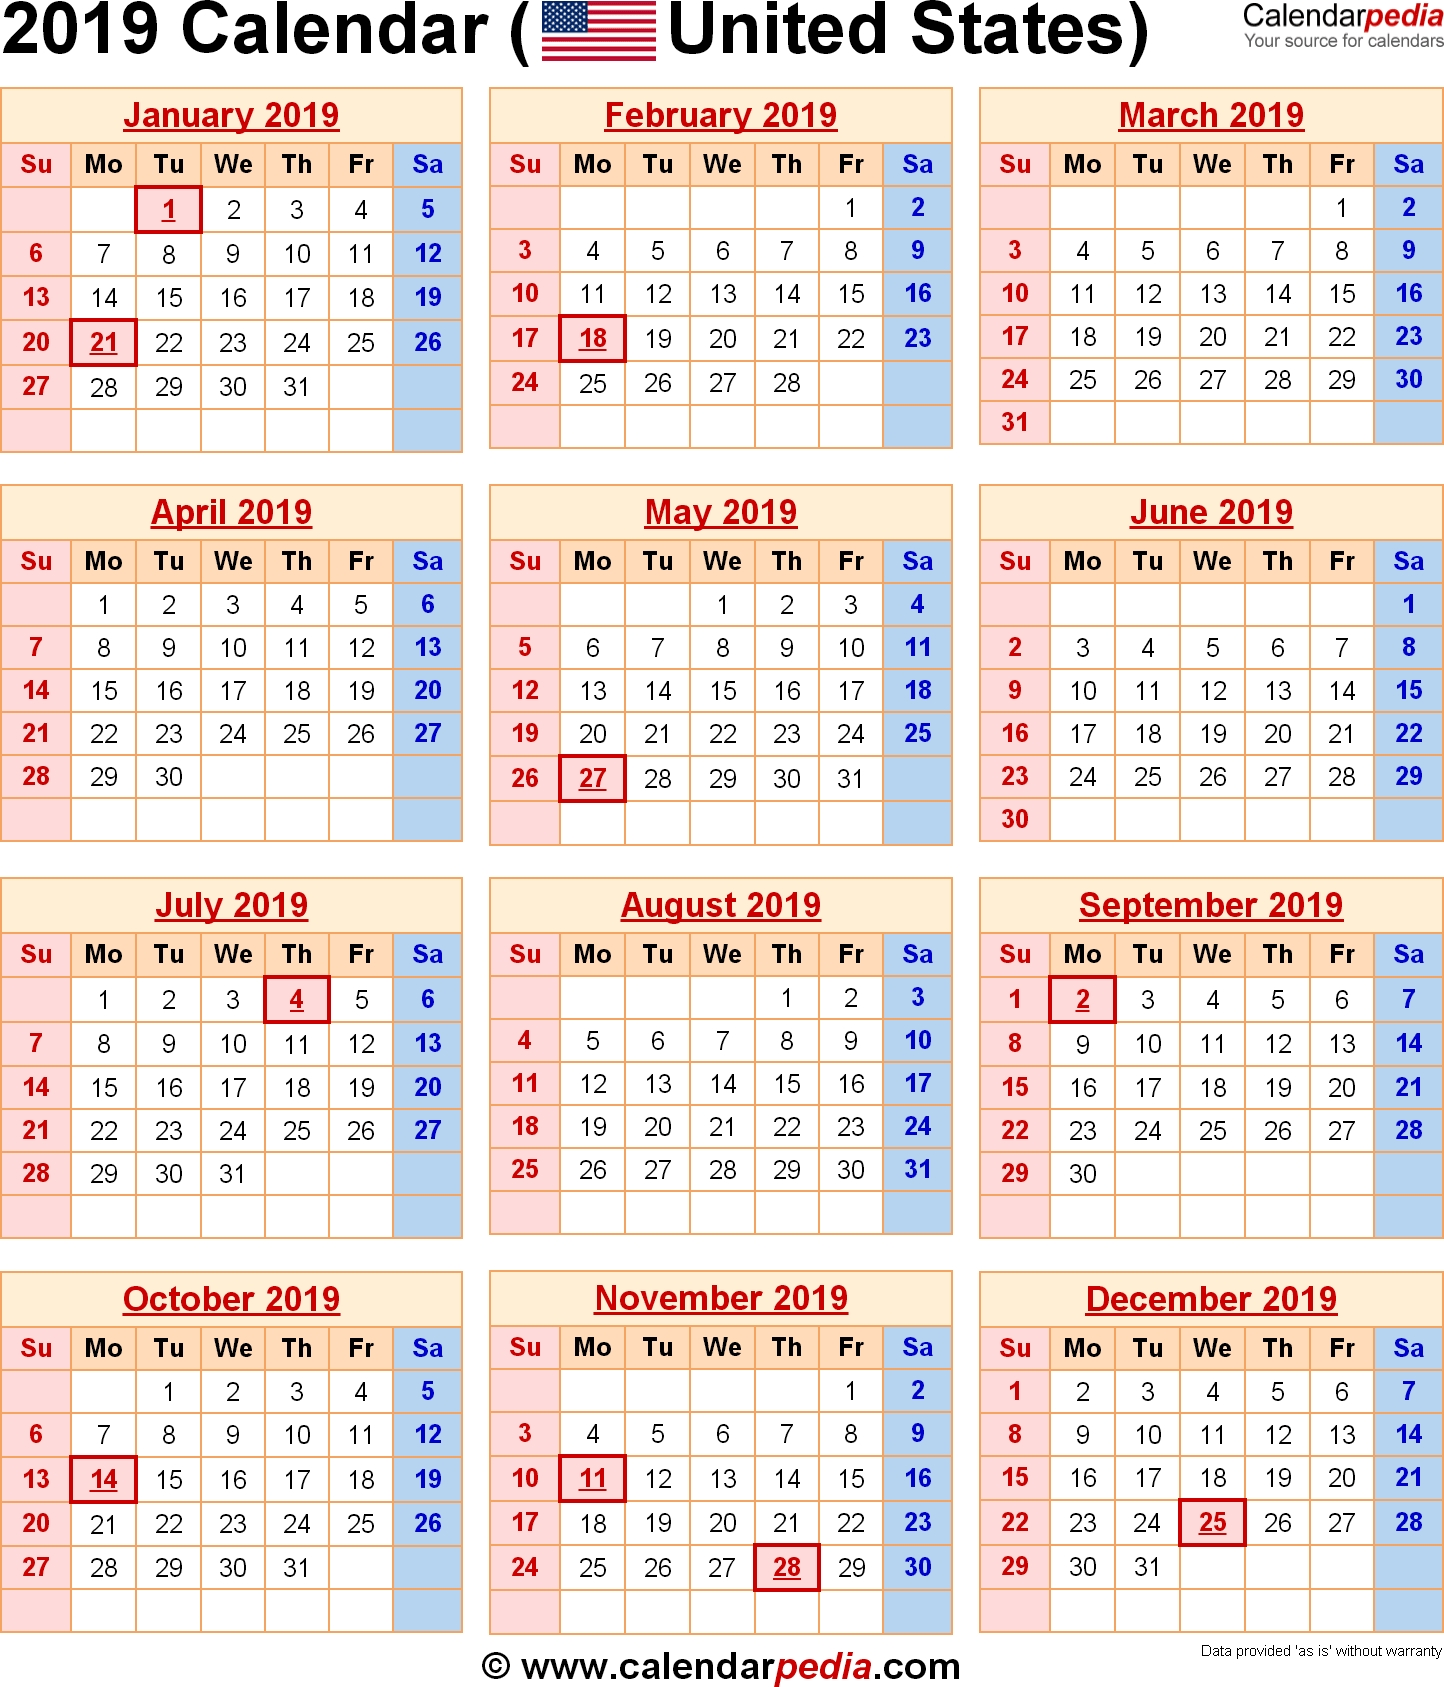 Image Result For 2019 Calendar With Holidays Usa | A Today Calendar 2019 With Holidays Usa